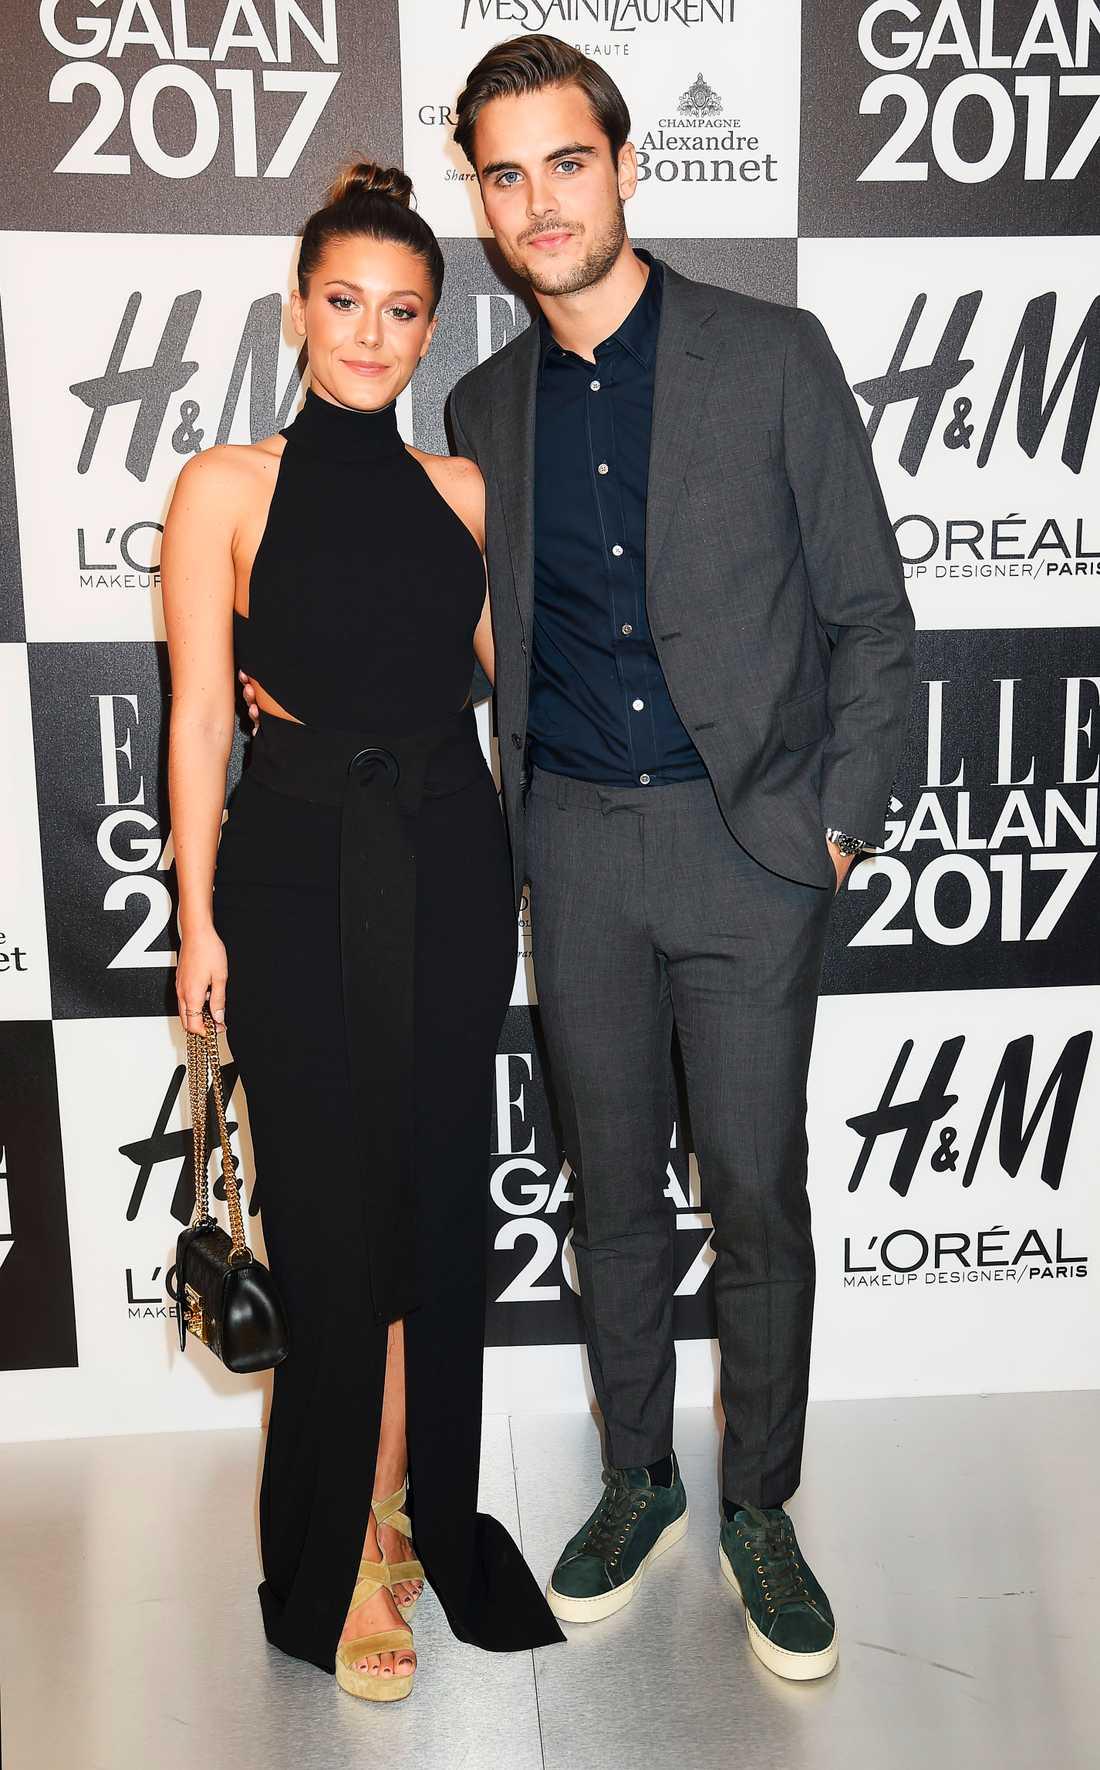 Bianca Ingrosso och Philippe Cohen på Elle-galan.